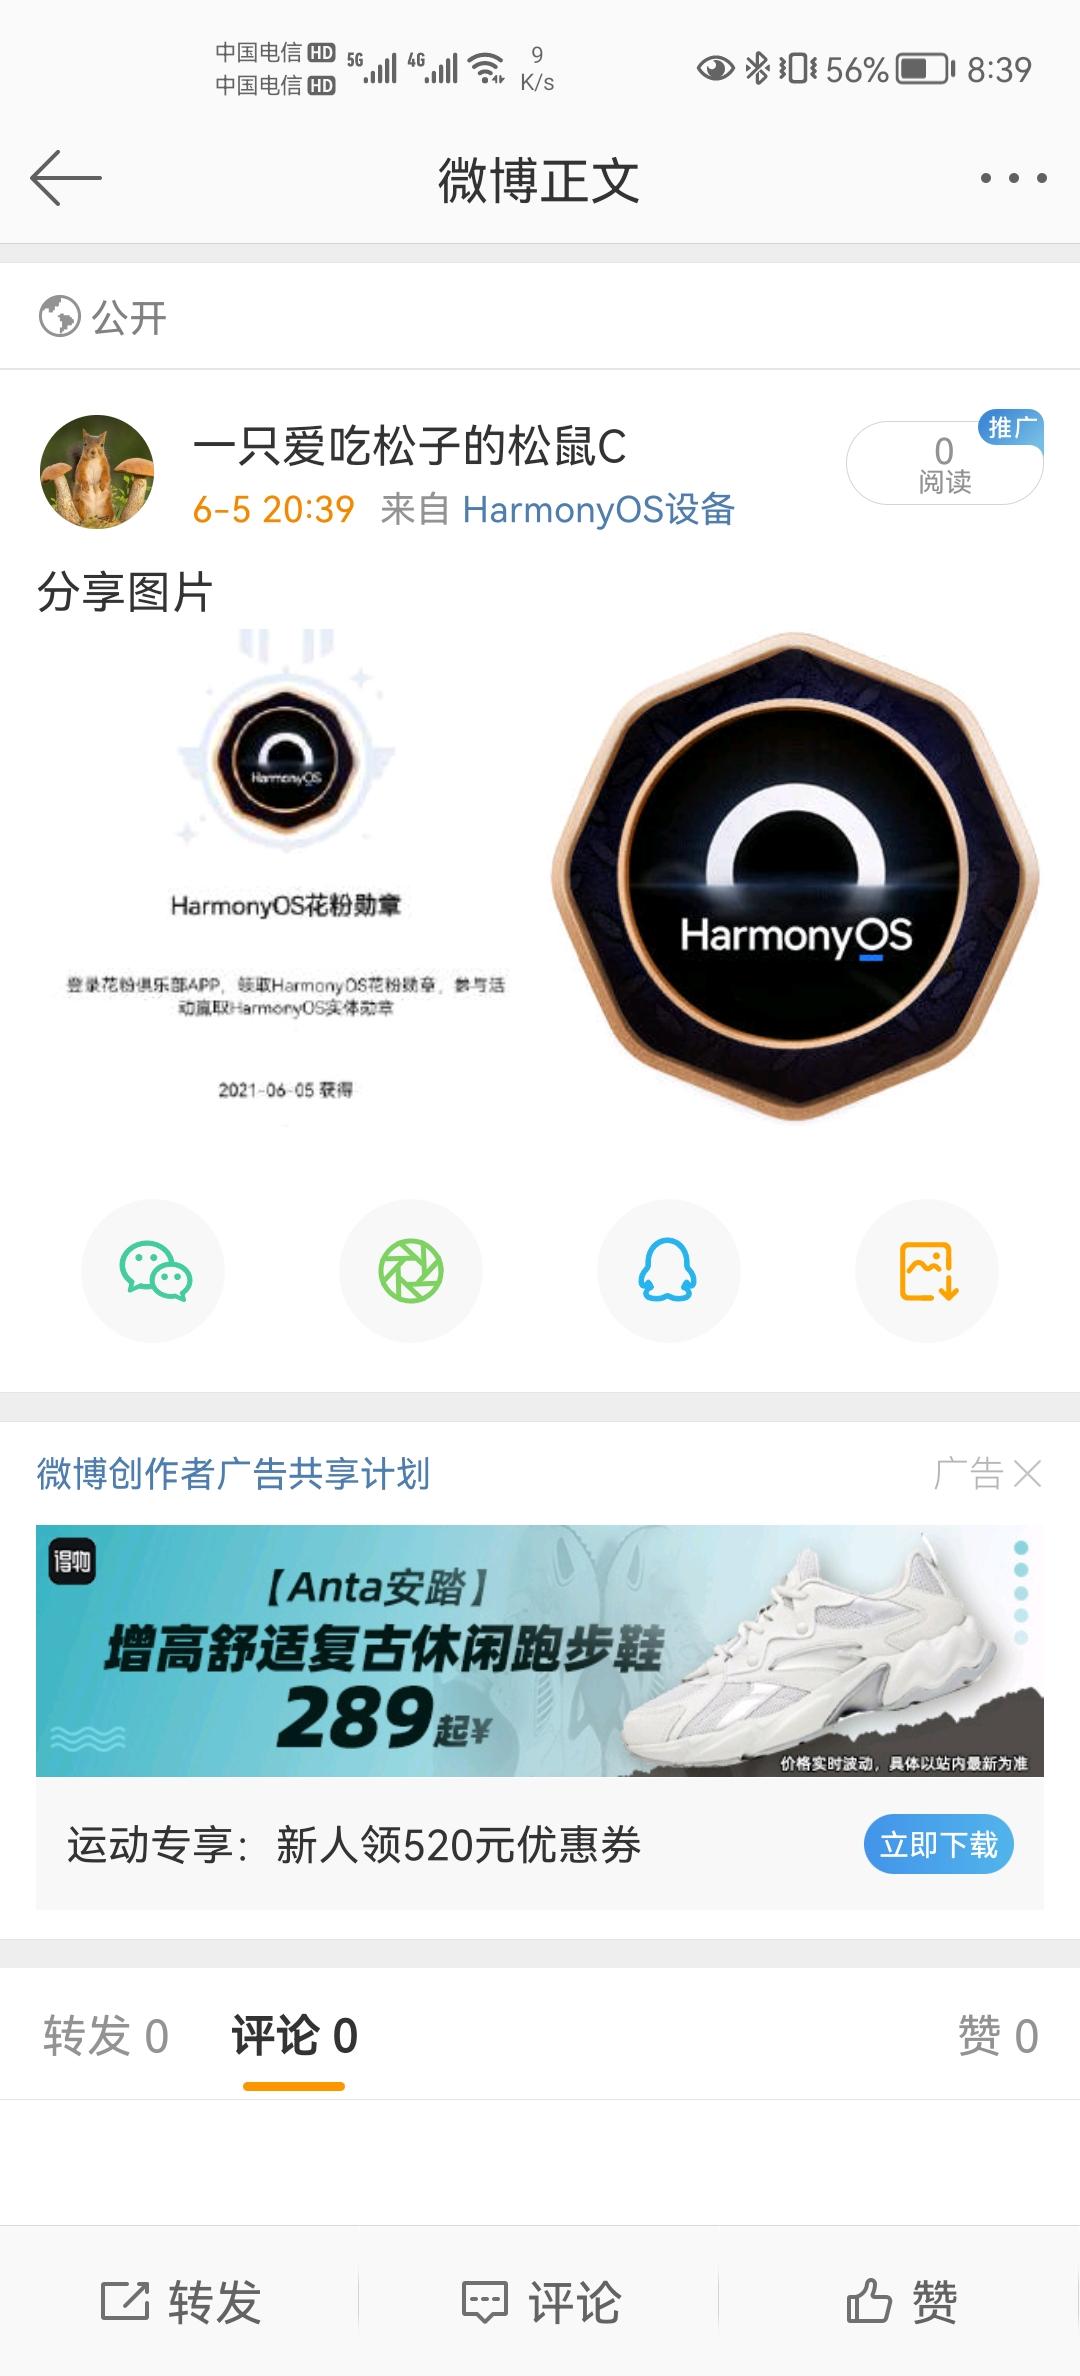 Screenshot_20210605_203941_com.sina.weibo.jpg